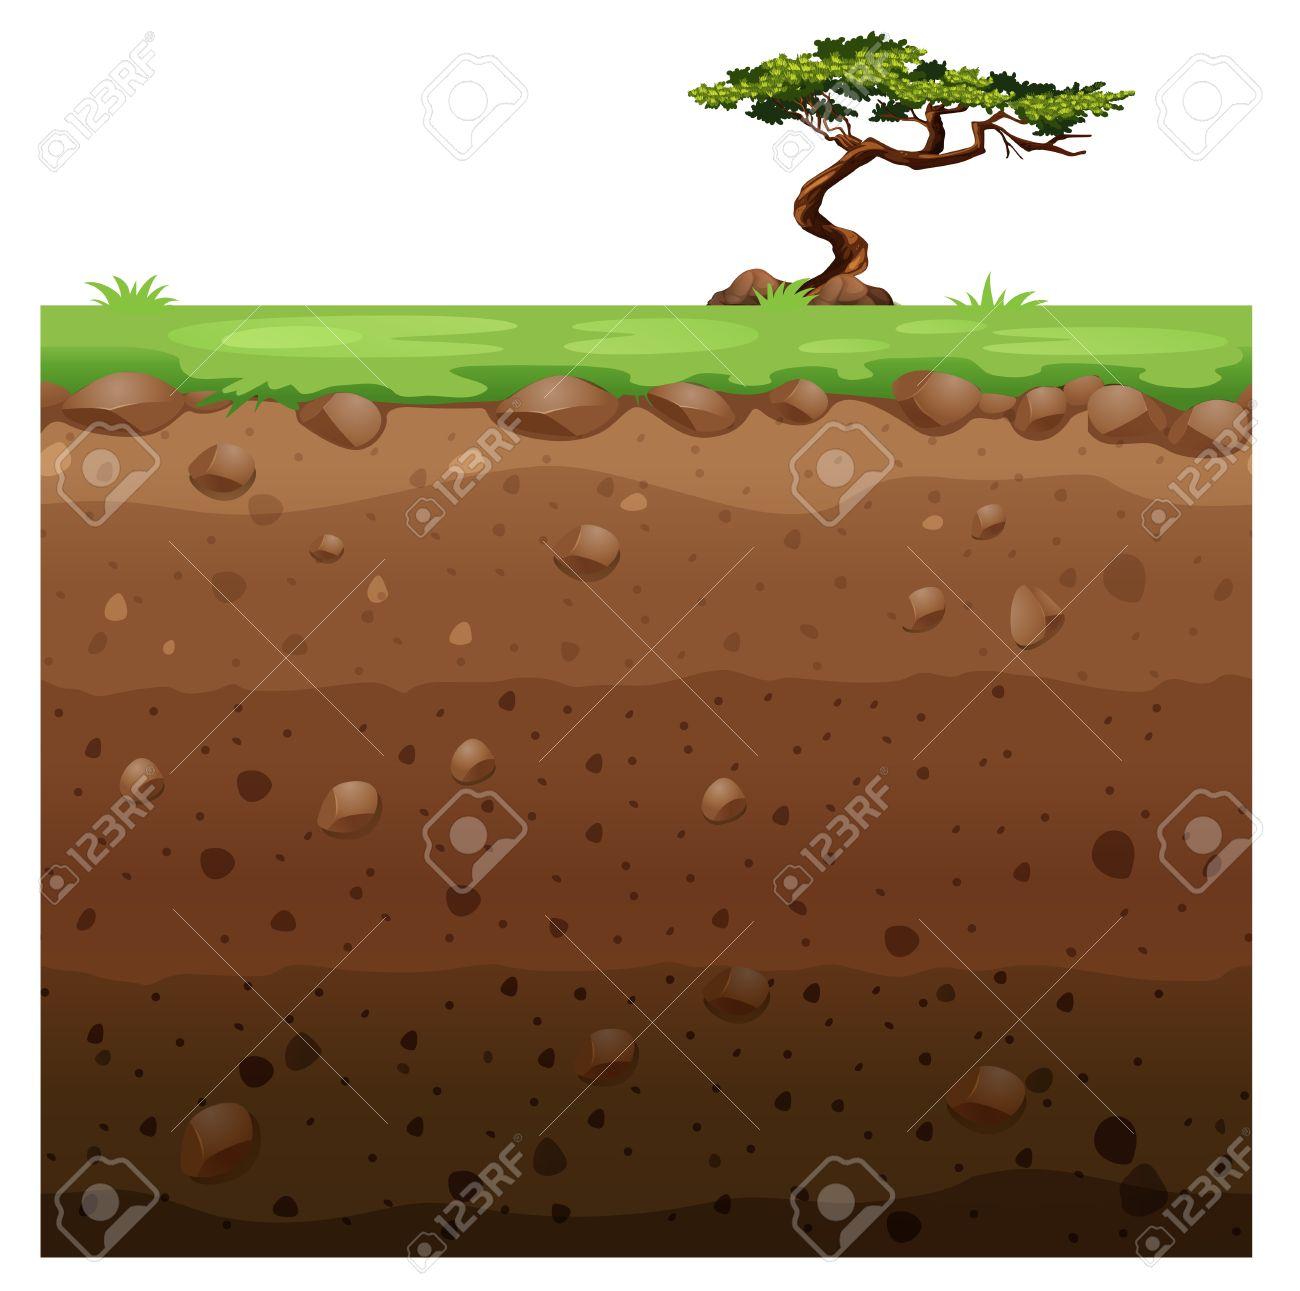 Single tree on surface and underground scene illustration - 50176484